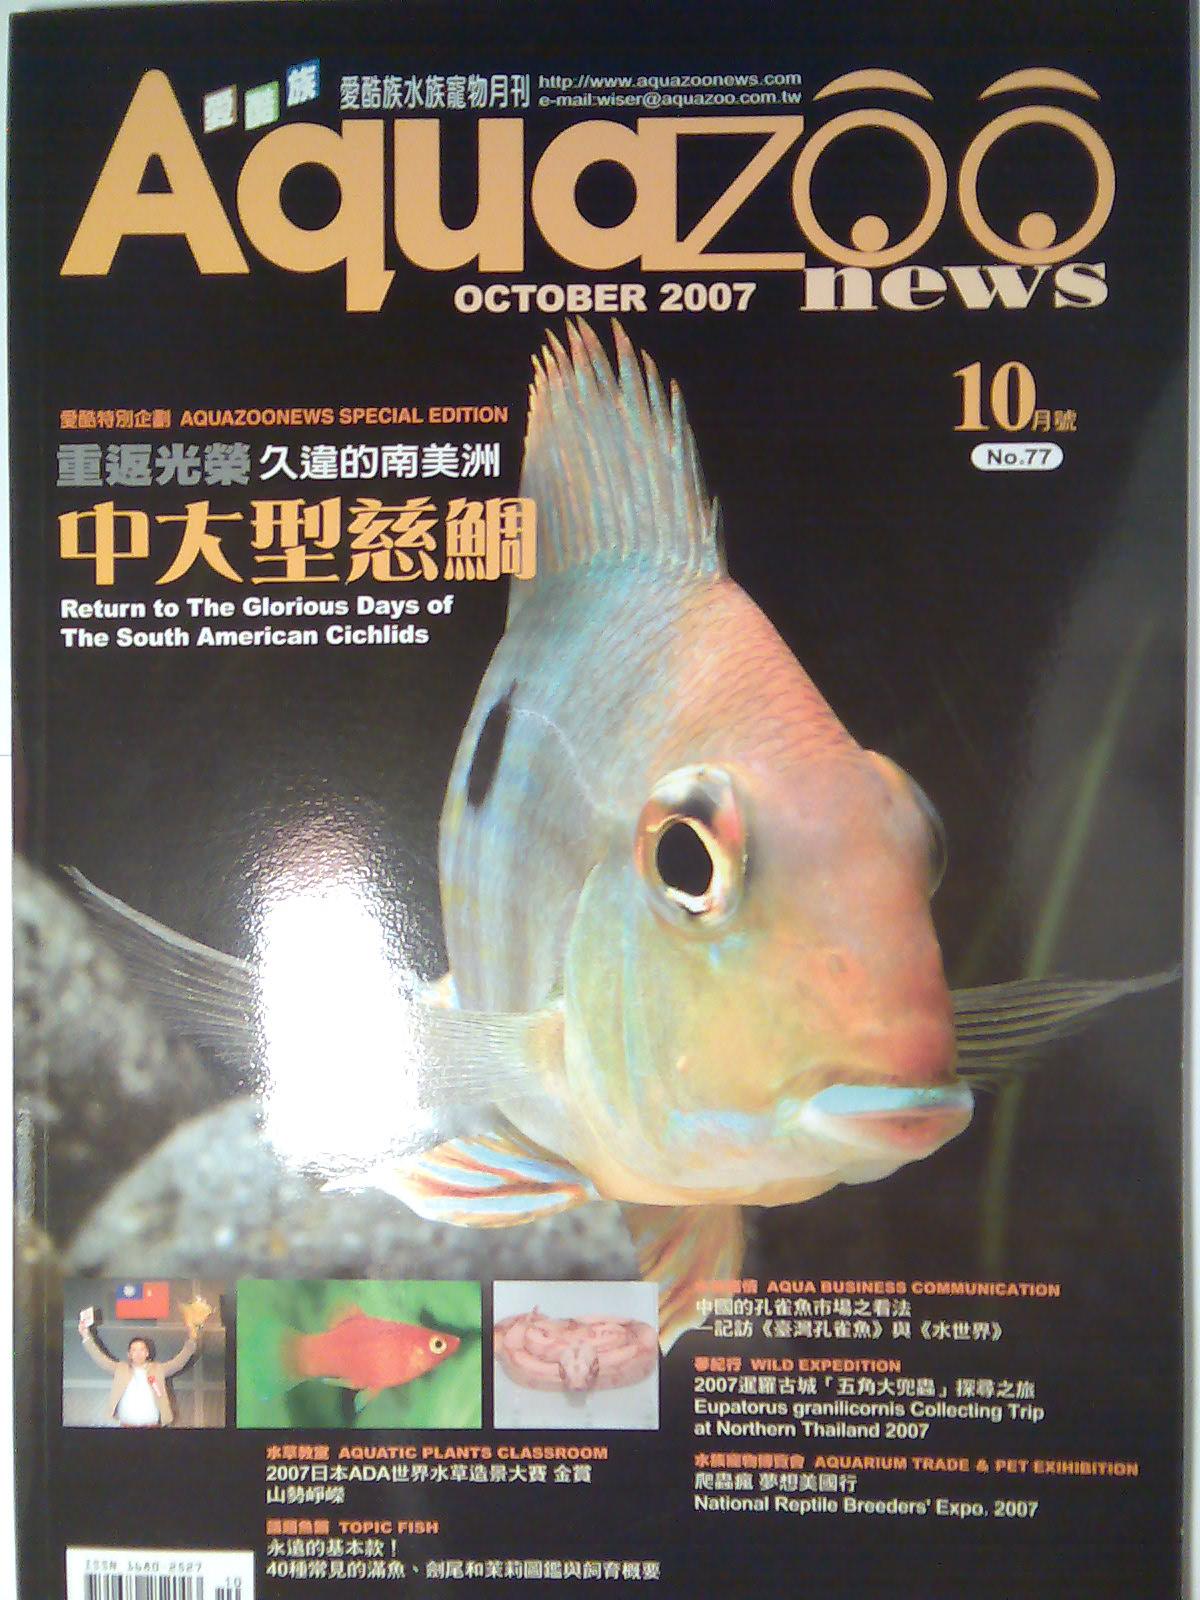 Aquazoo news愛酷族水族寵物月刊